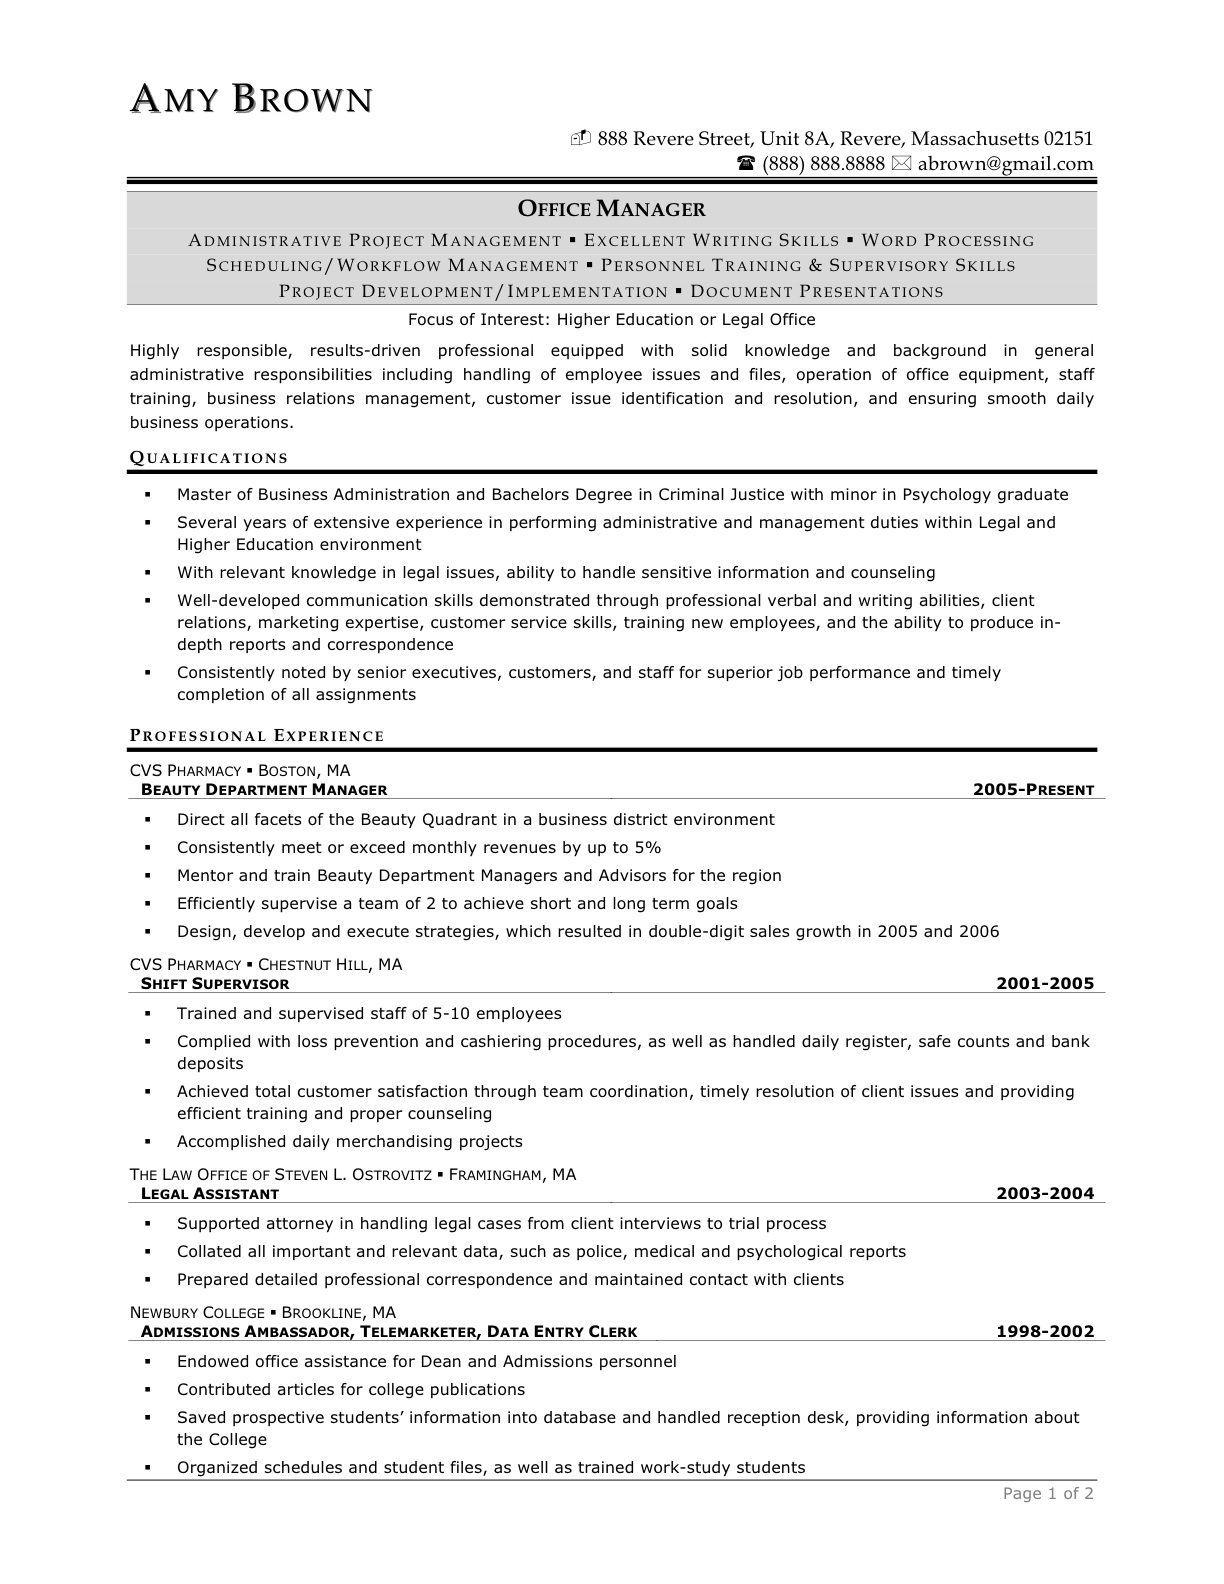 Resume Sample 2020 Philippines